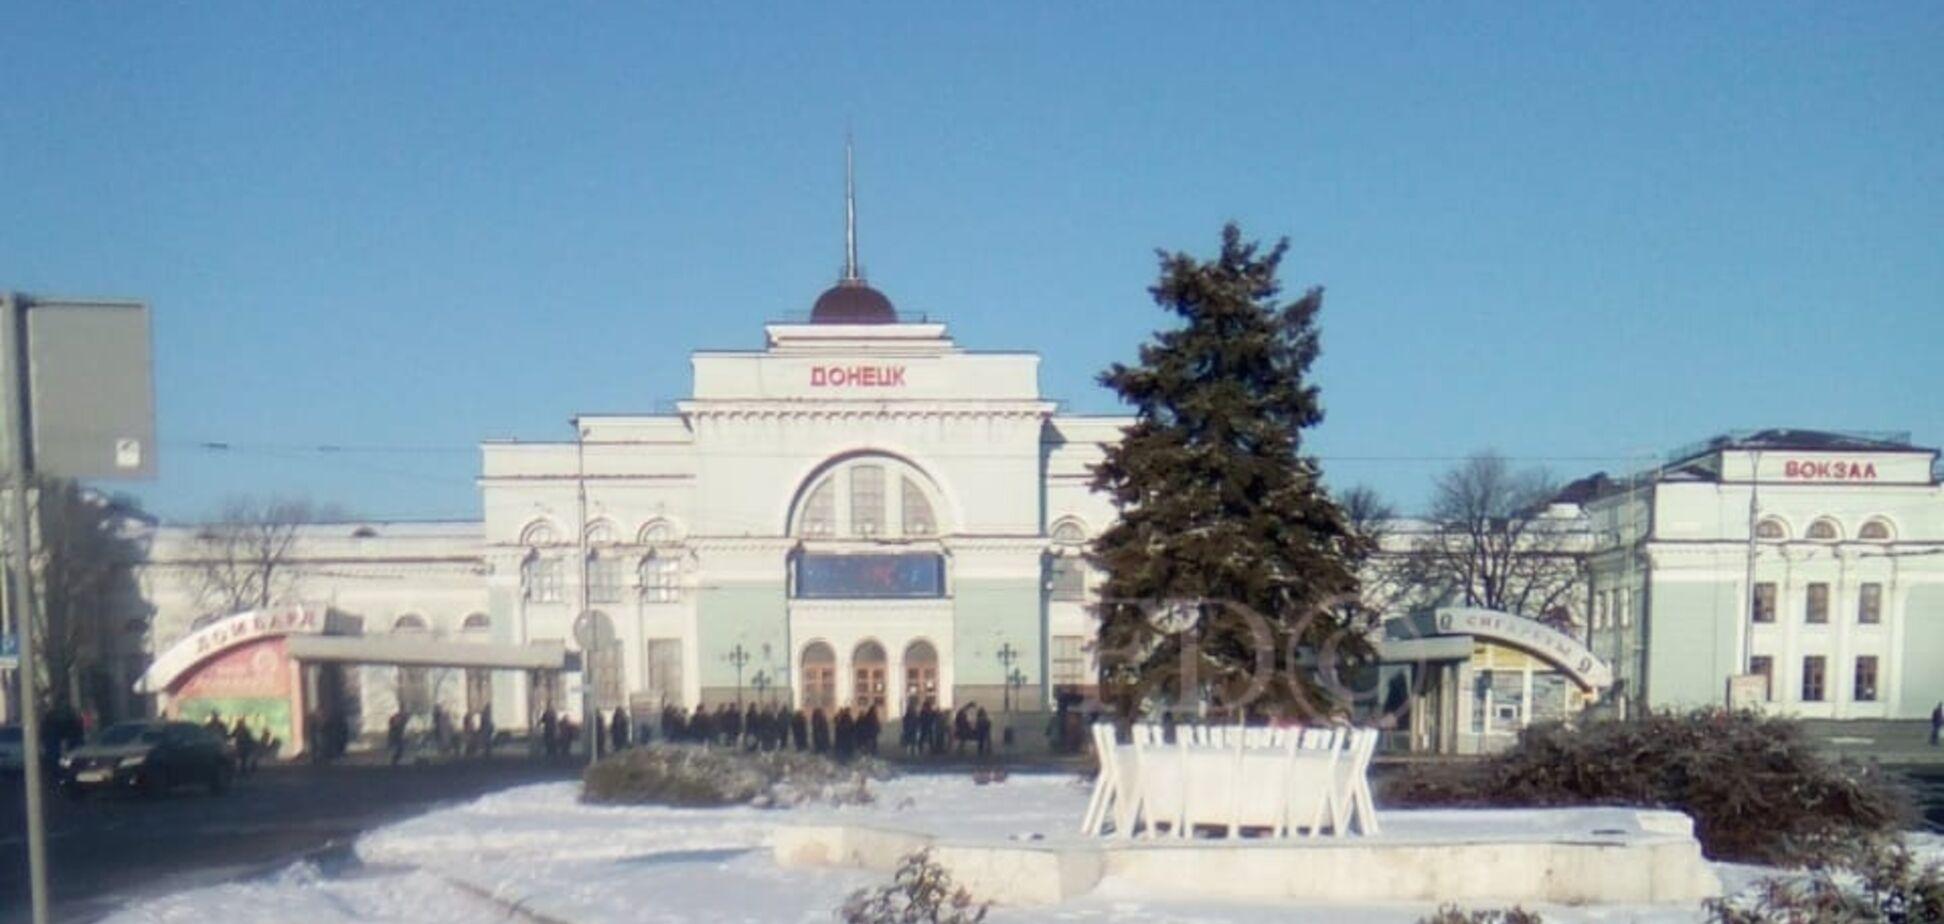 Будни хунто-папарацци в Донецке